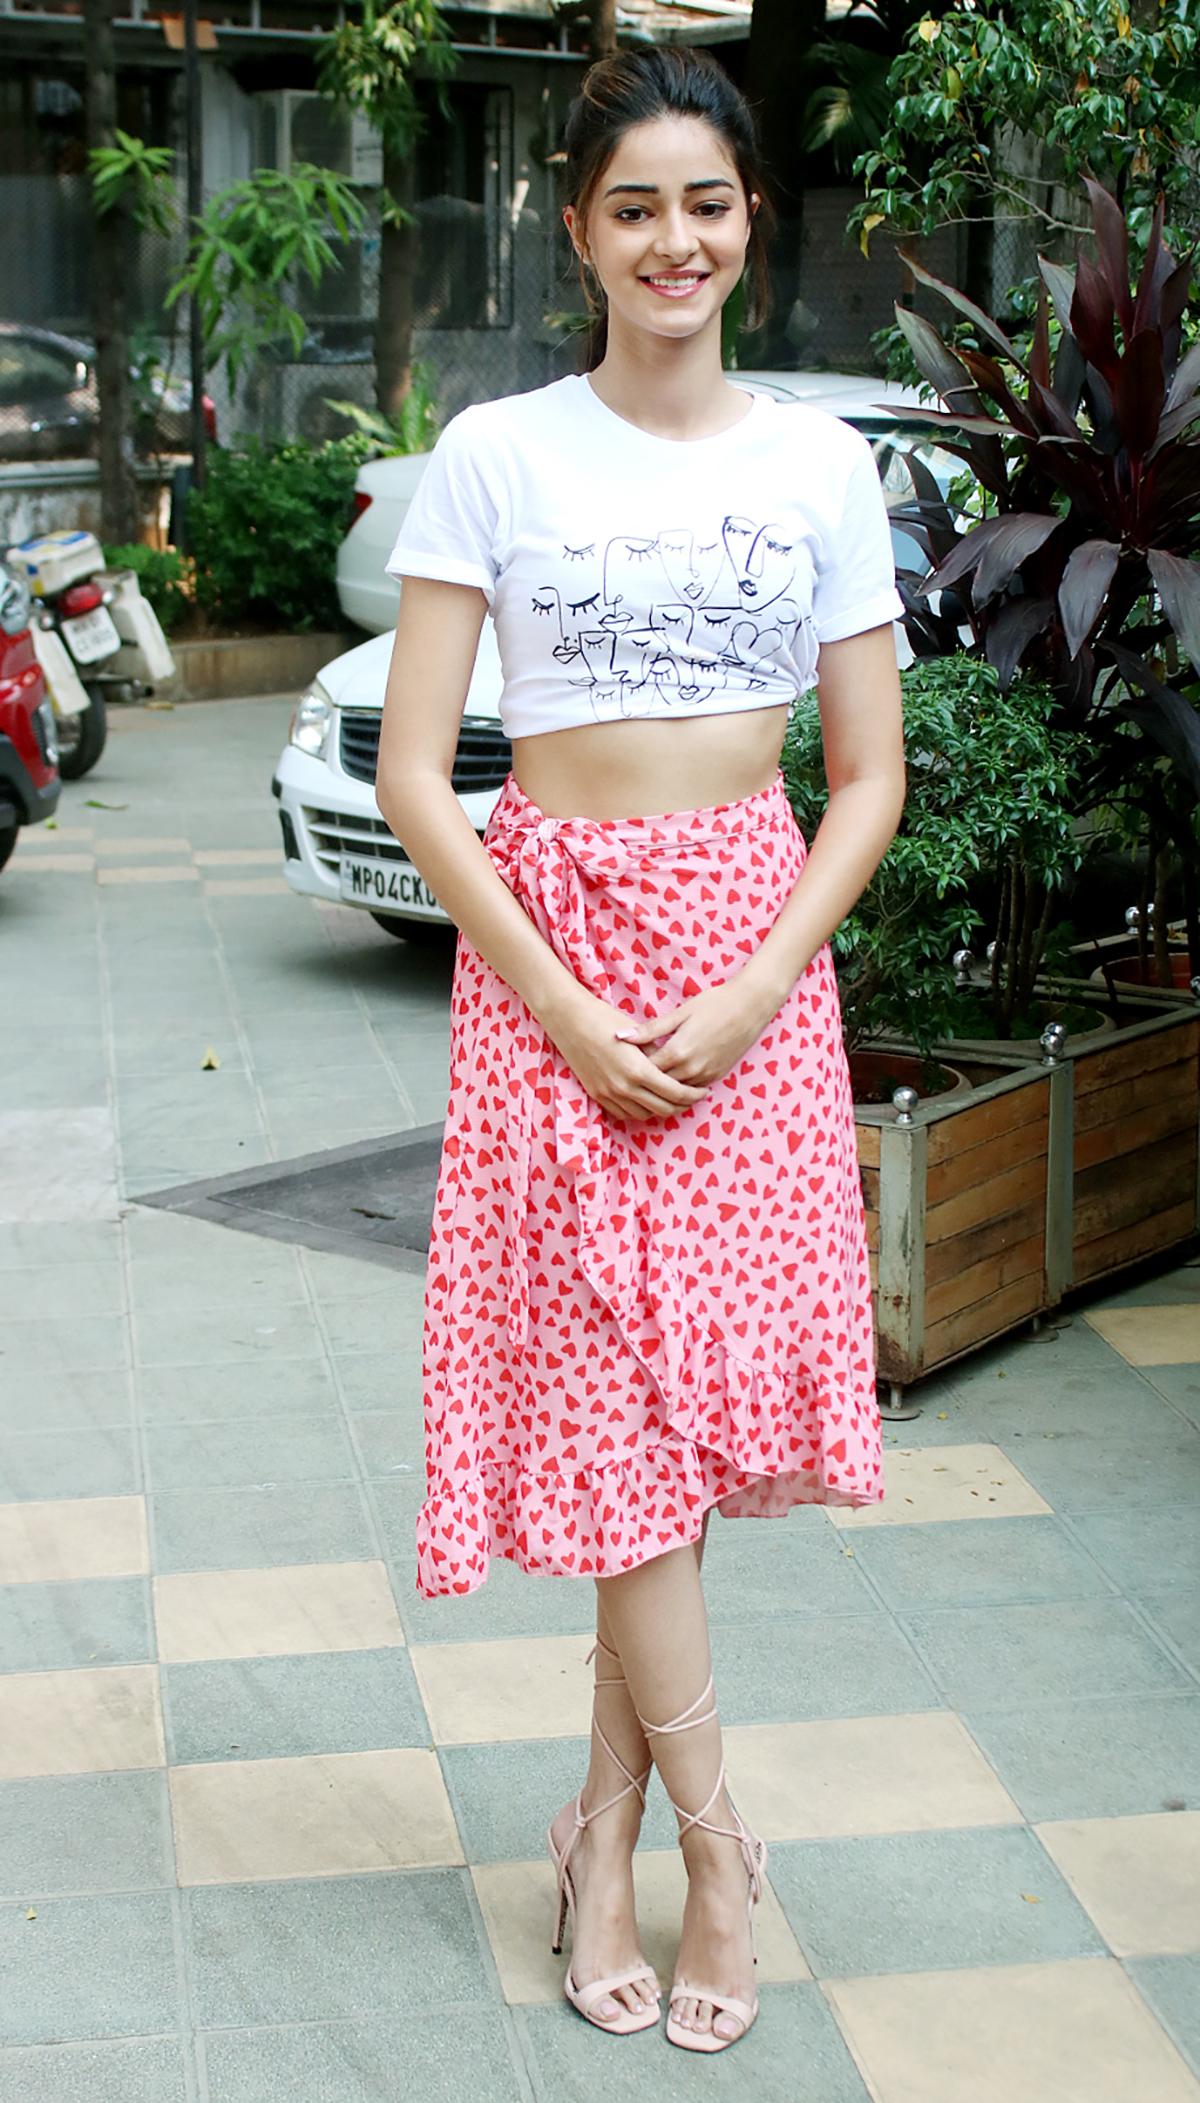 Ananya Panday for Pati, Patni Aur Woh promotions (5)